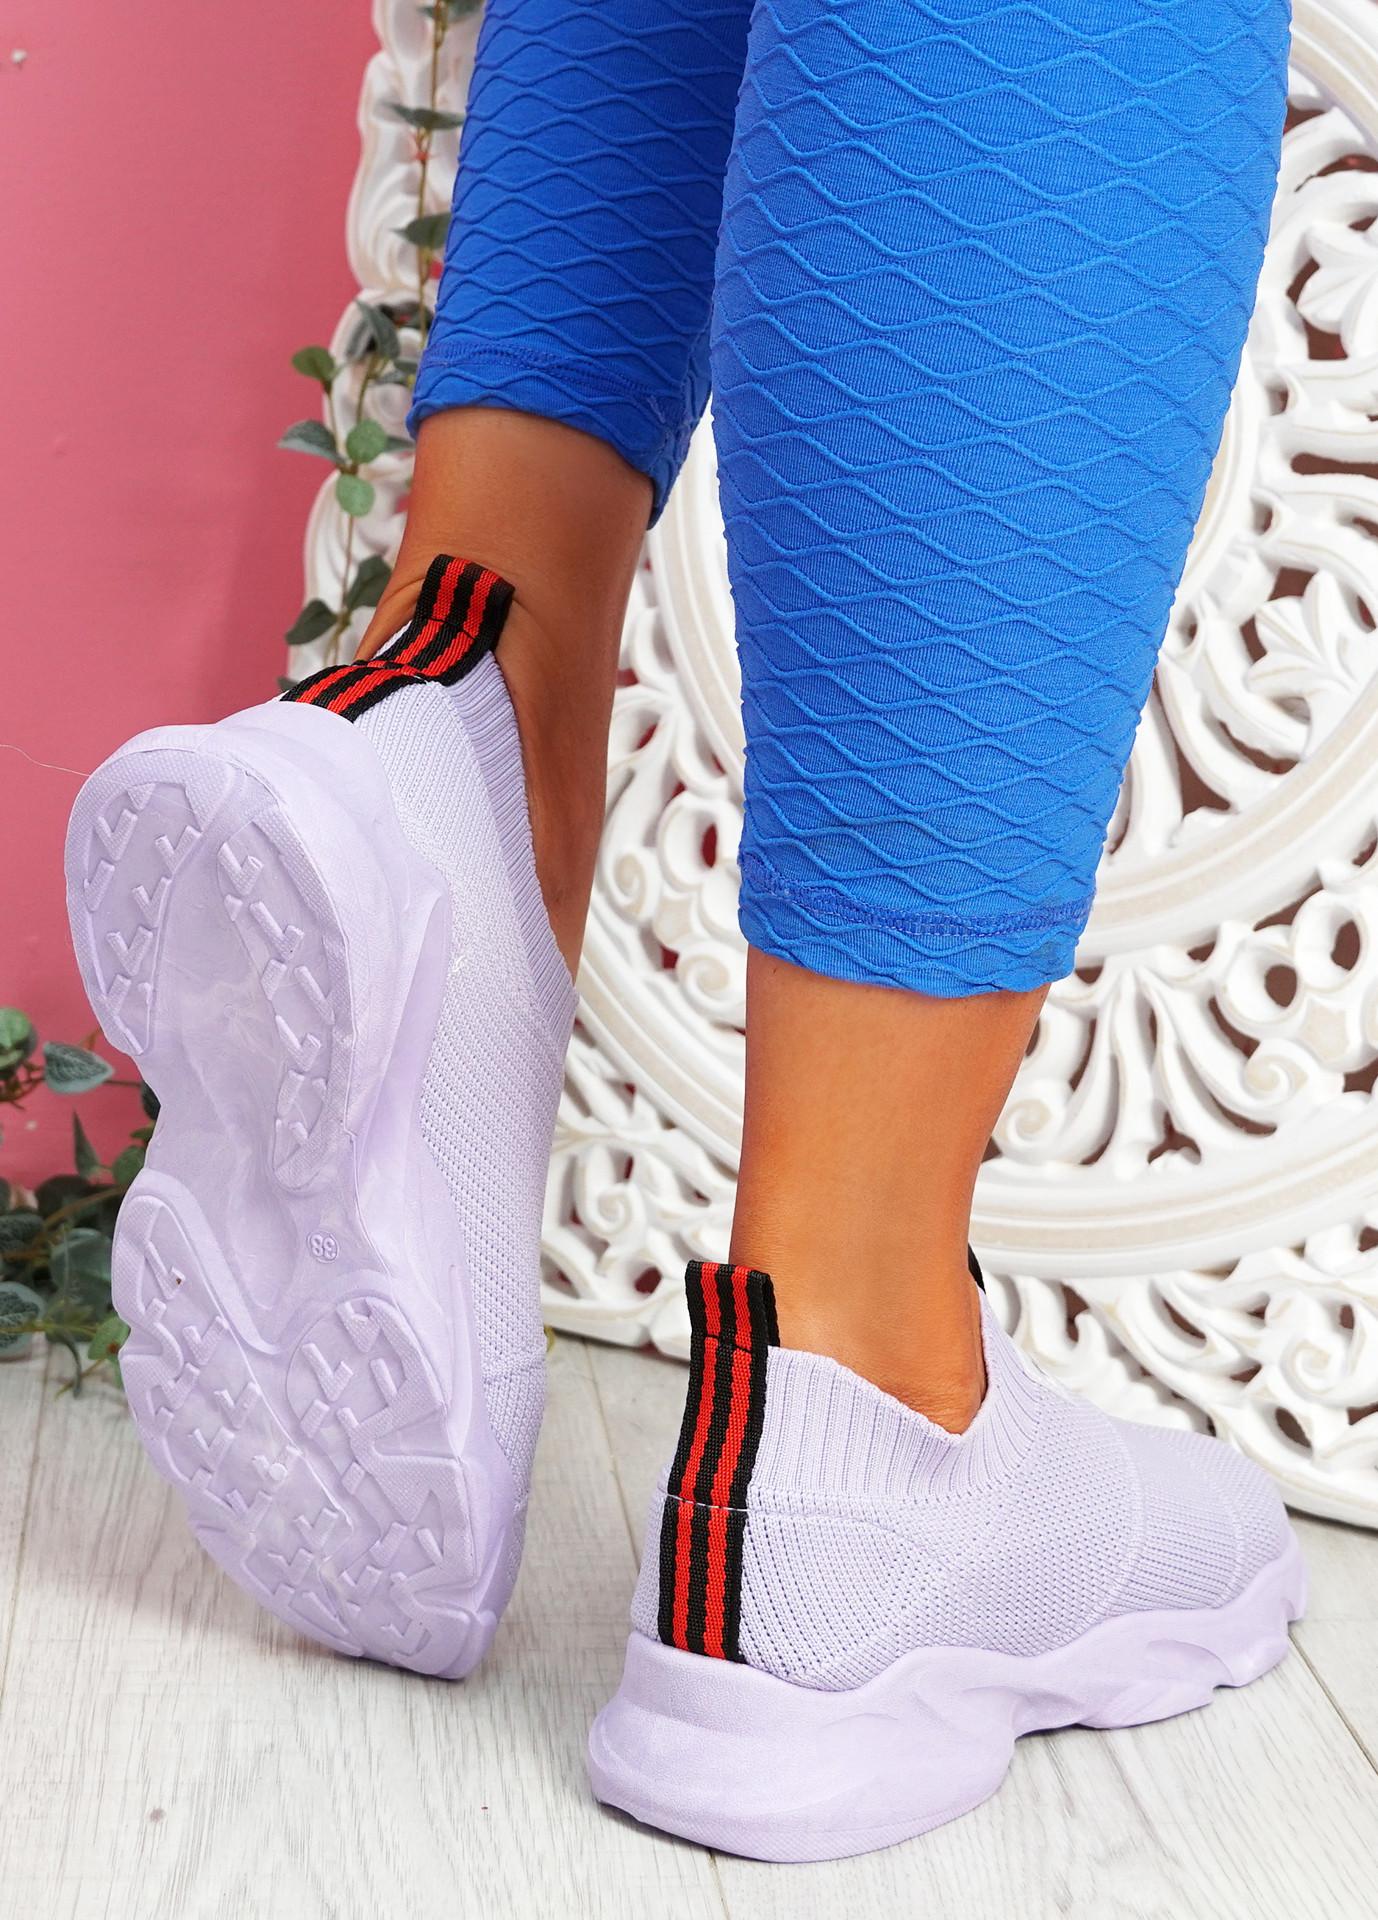 Vidy Purple Knit Trainers